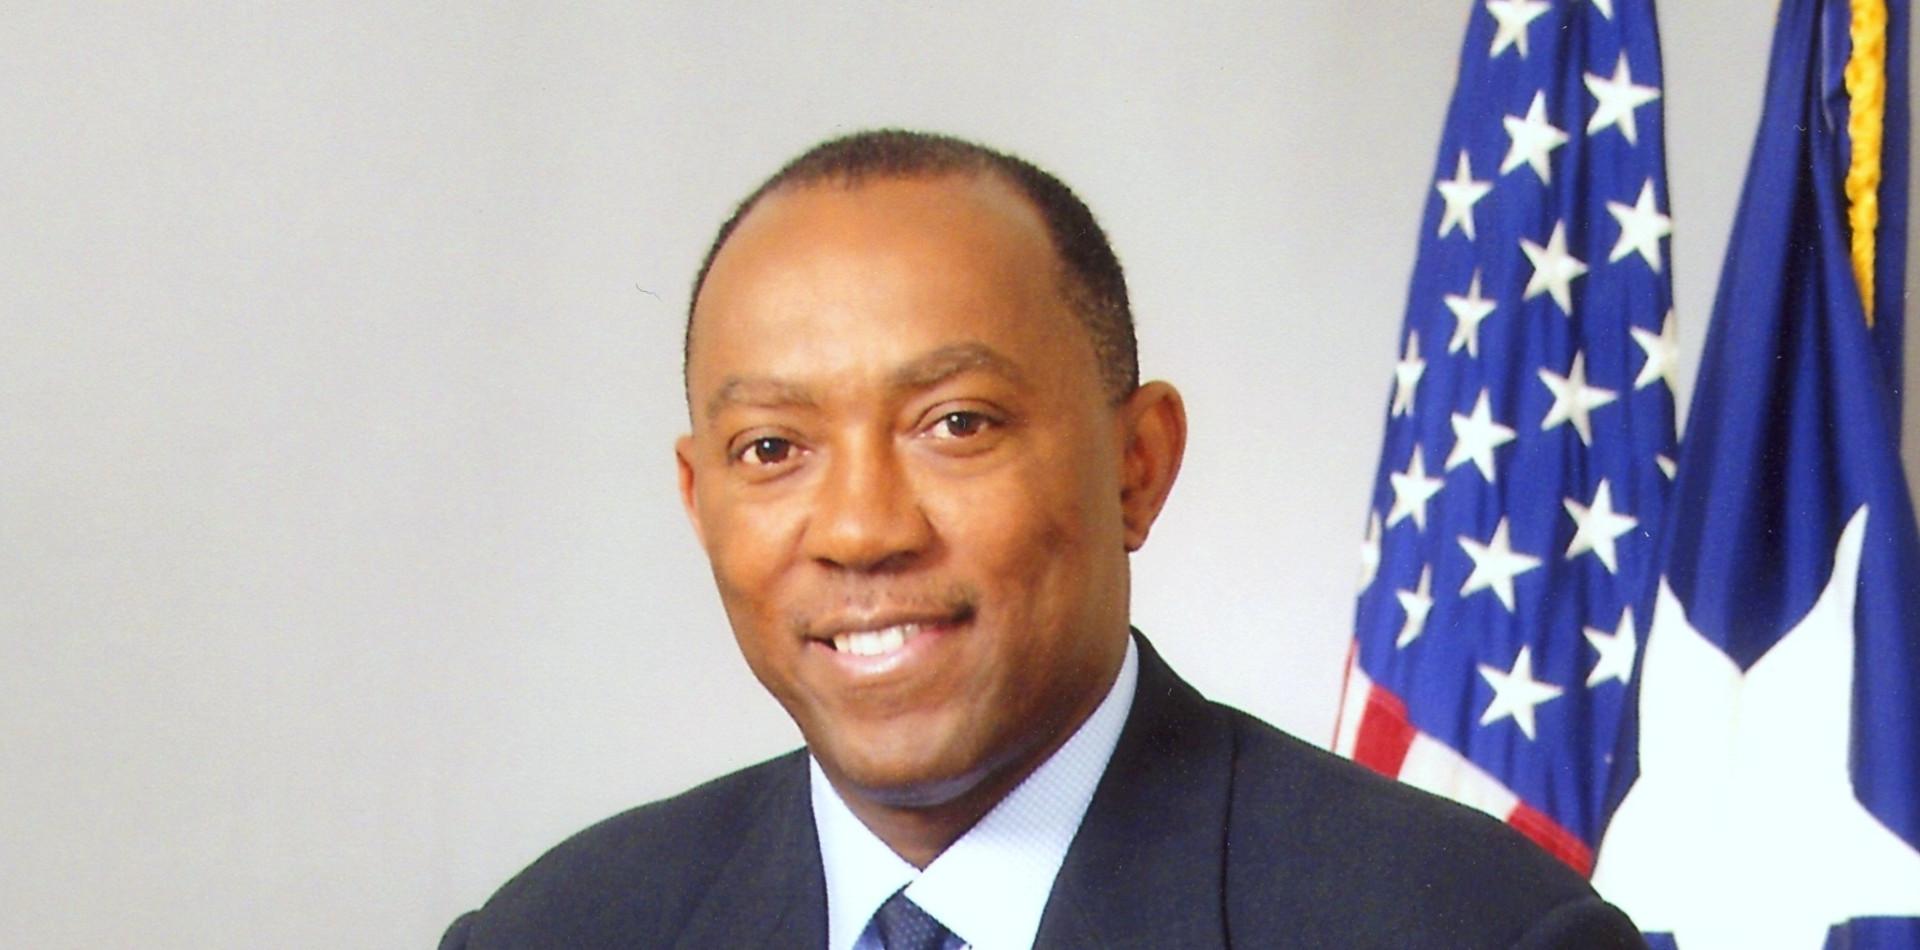 City of Houston, Mayor Sylvester Turner